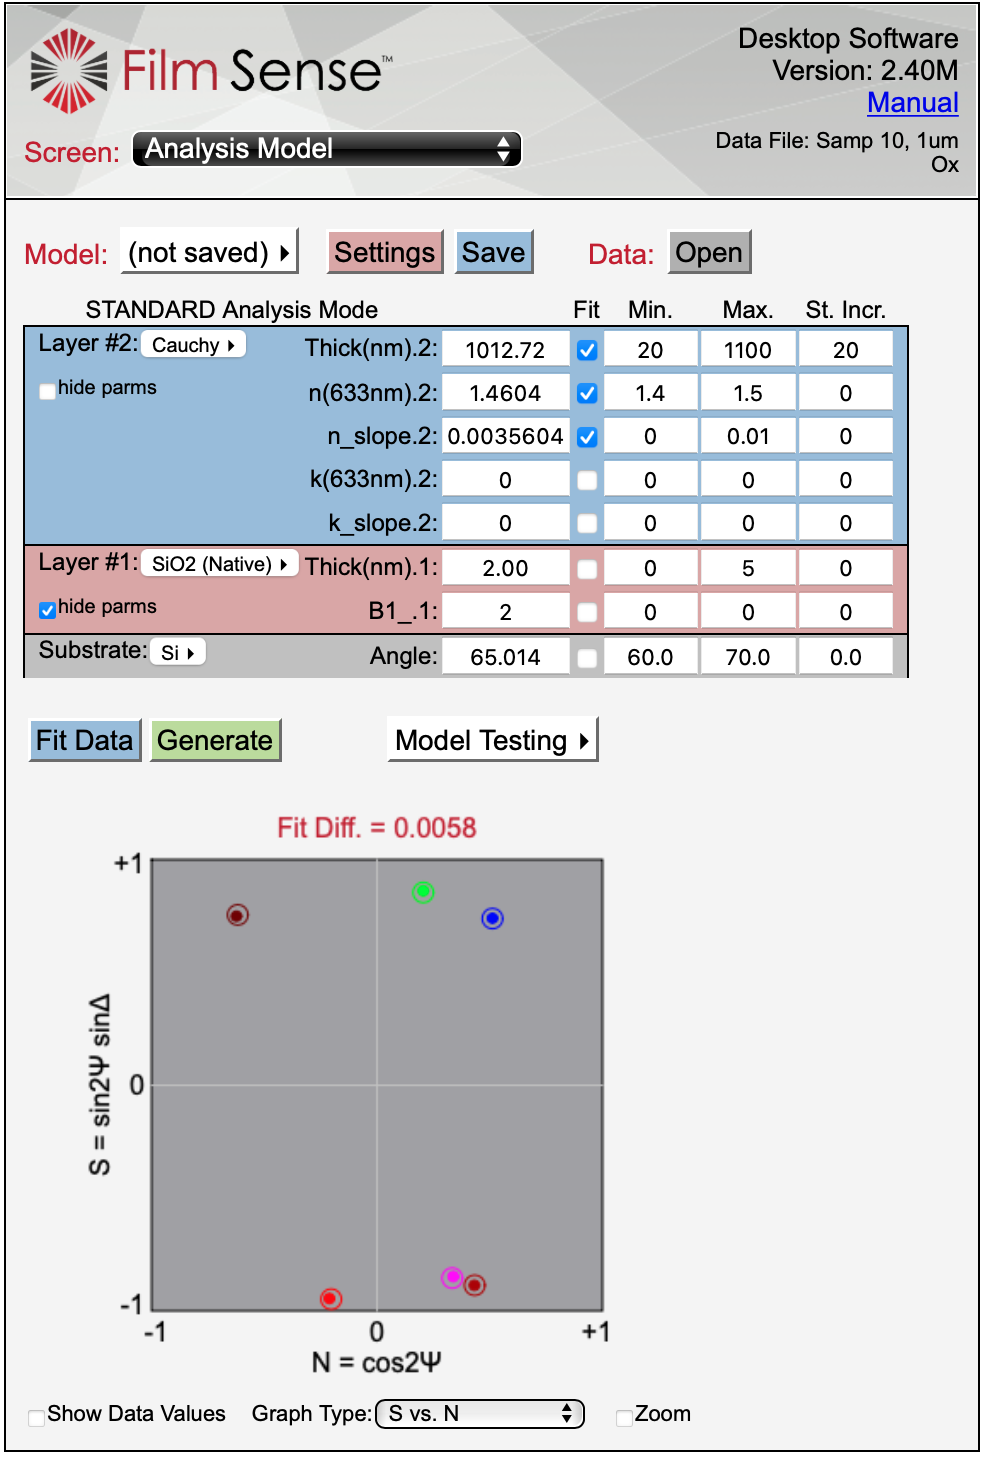 100 nm Oxide on Si Optical Model - Thin Film Measurement